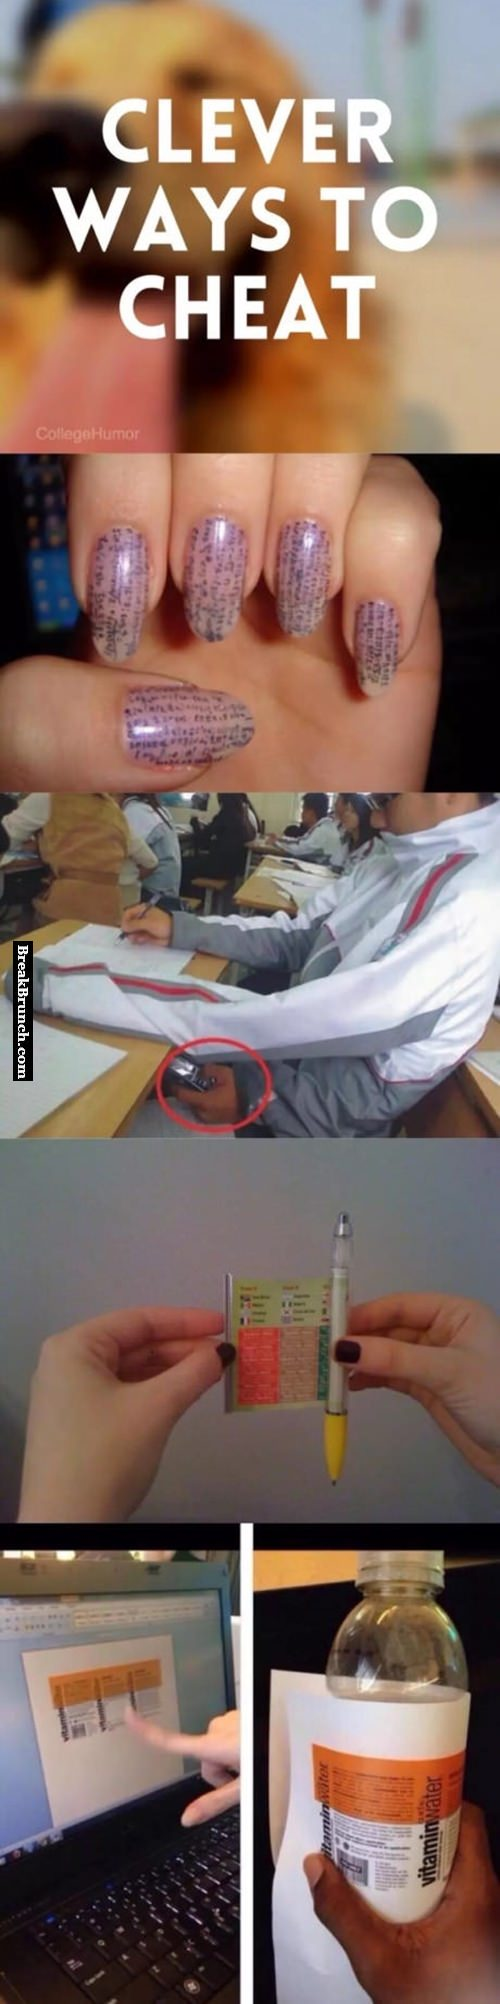 Smart ways to cheat on exams